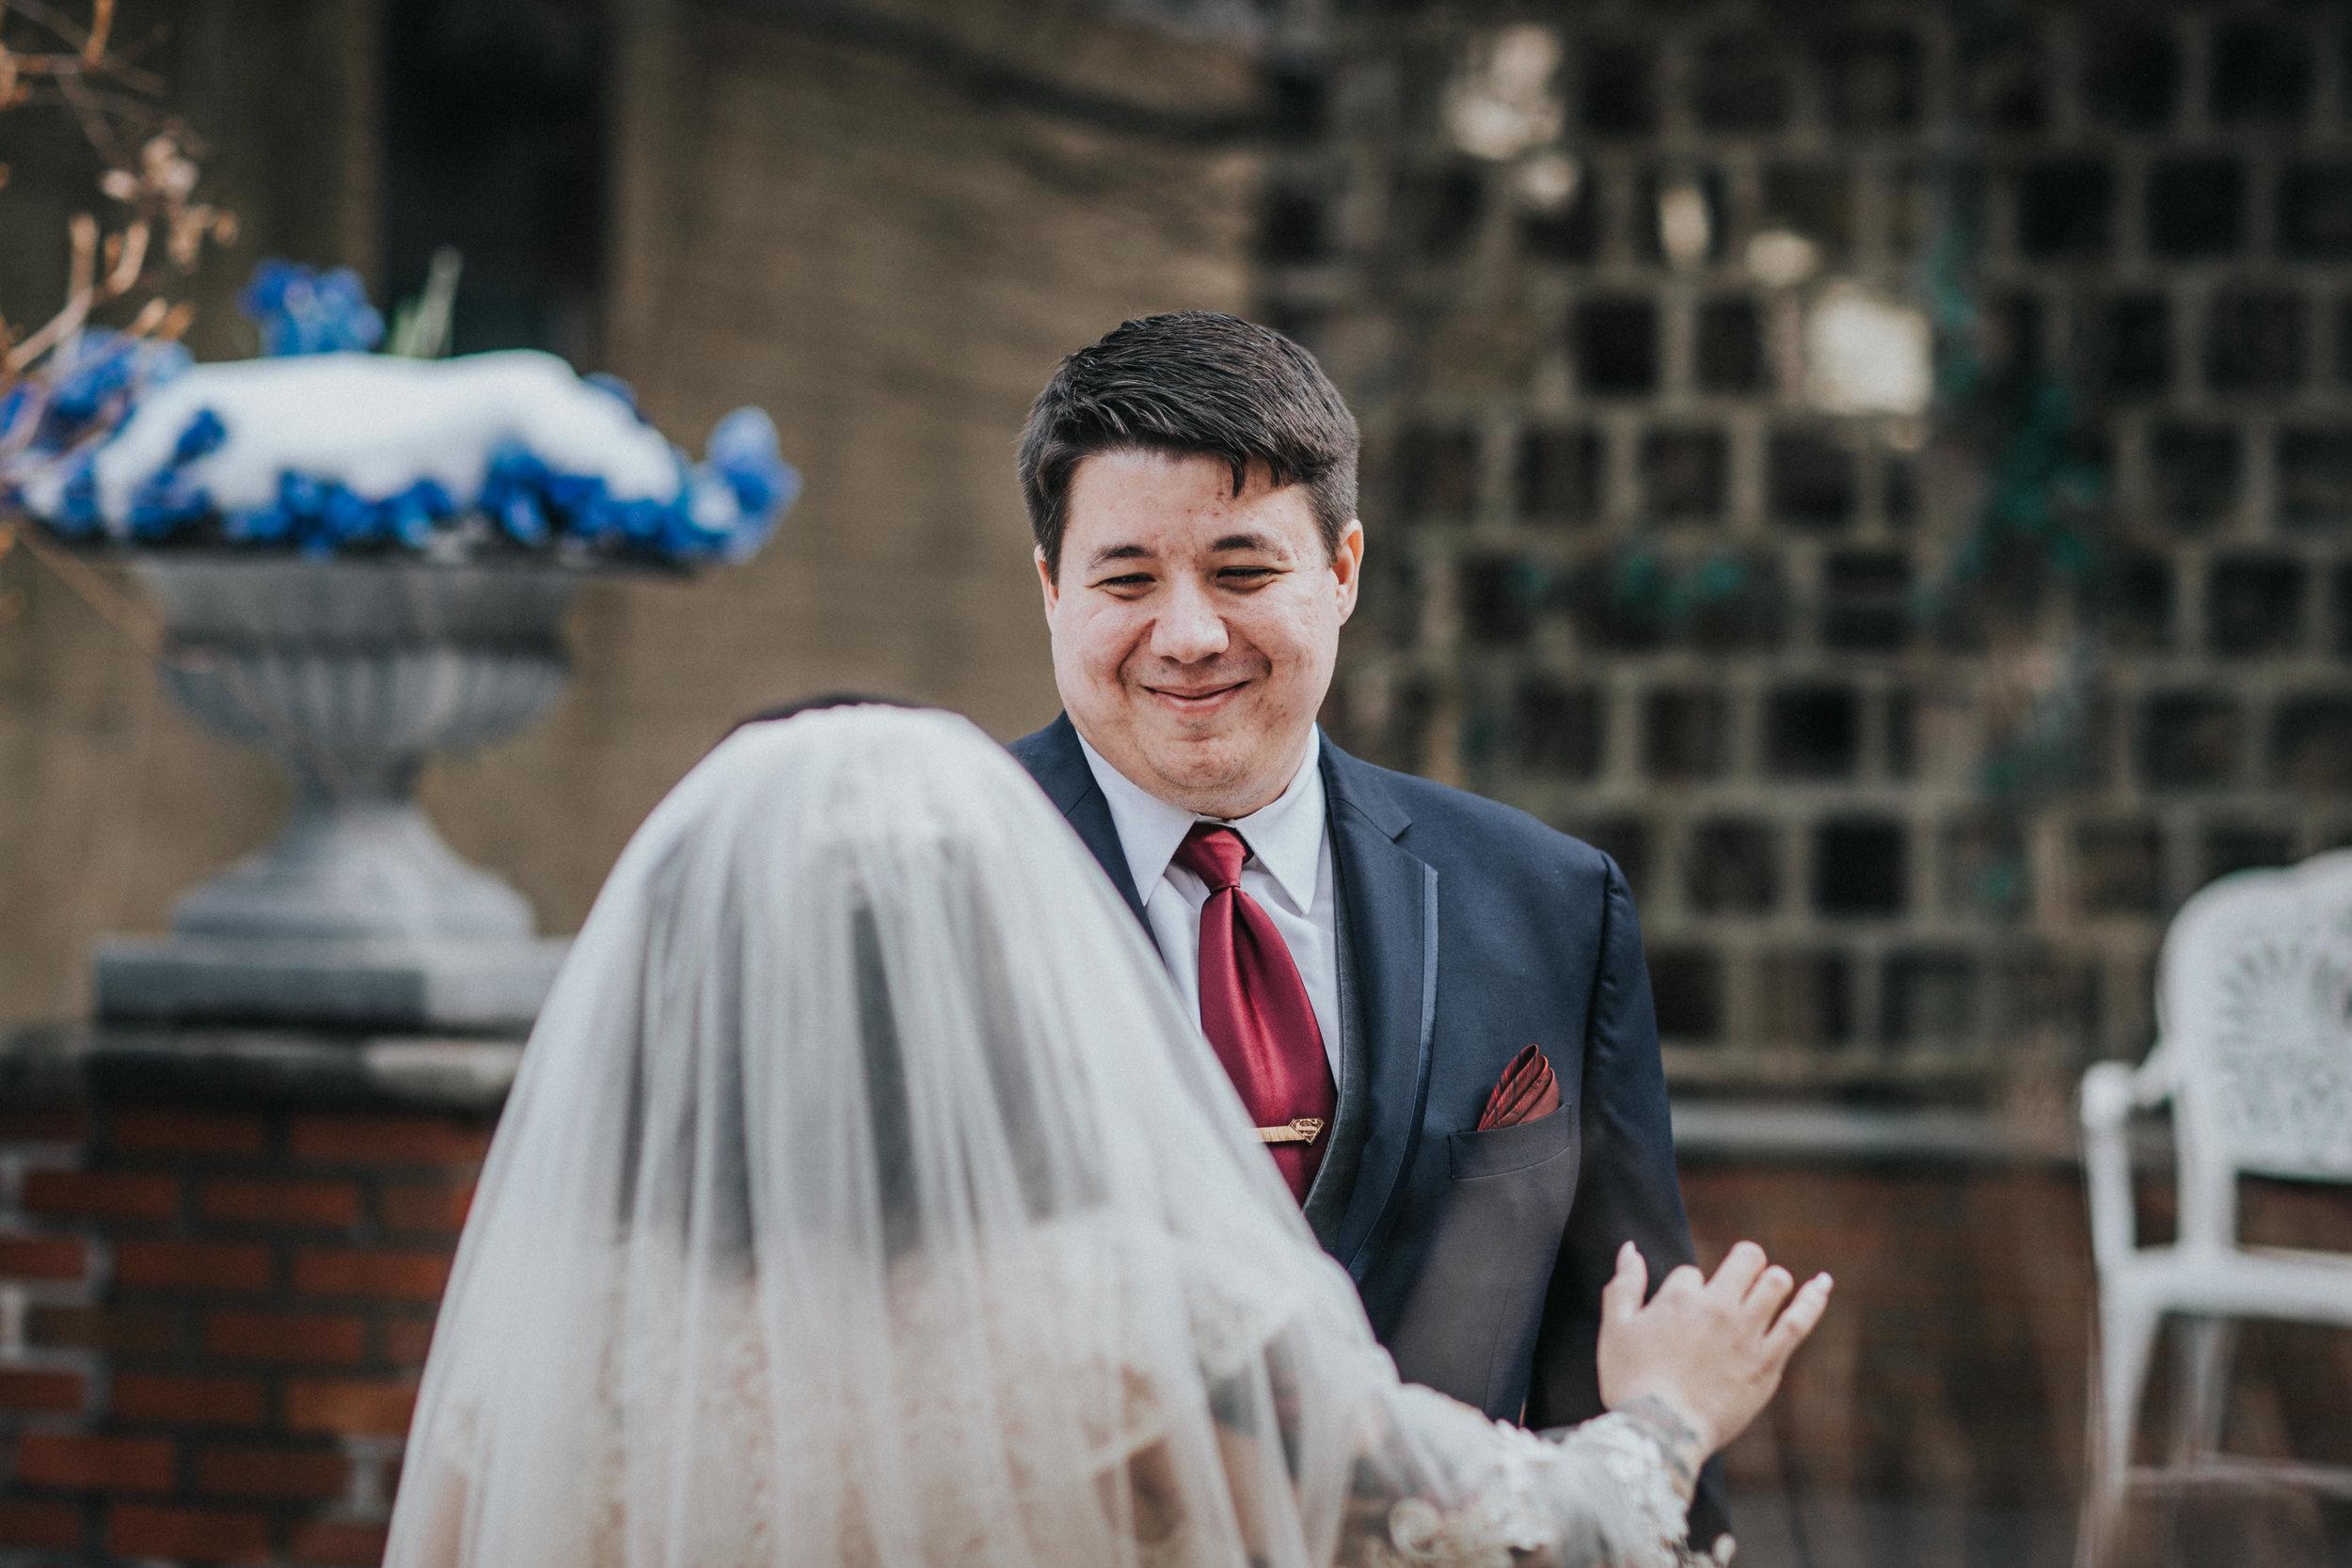 New-Jersey-Wedding-Photographer-ReceptionCenter-Valeria&Mike-First-Look-Bride&Groom (5 of 69).jpg